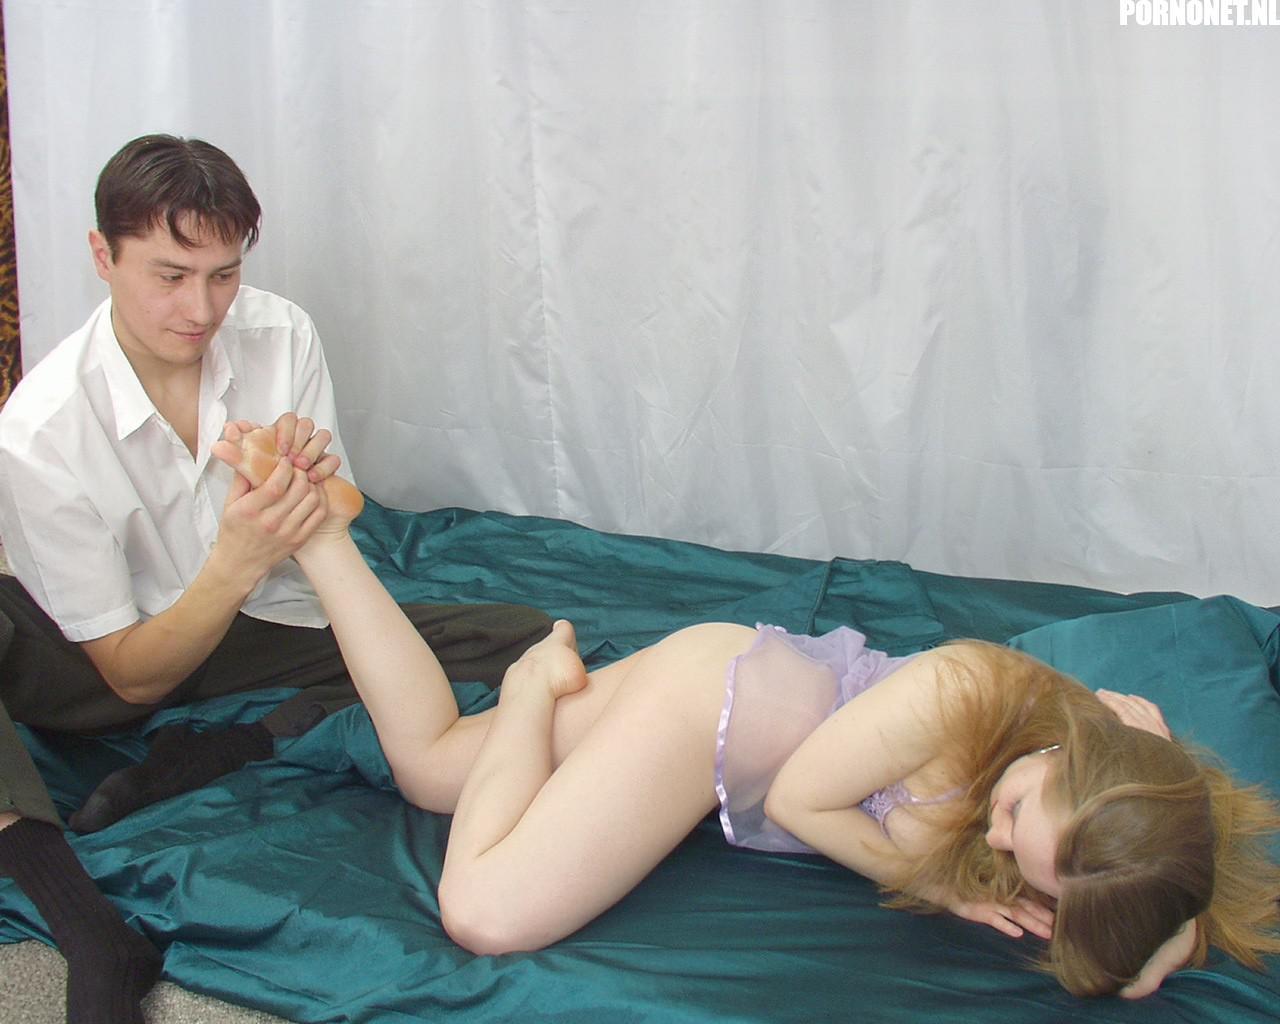 echte Ebony Sex video